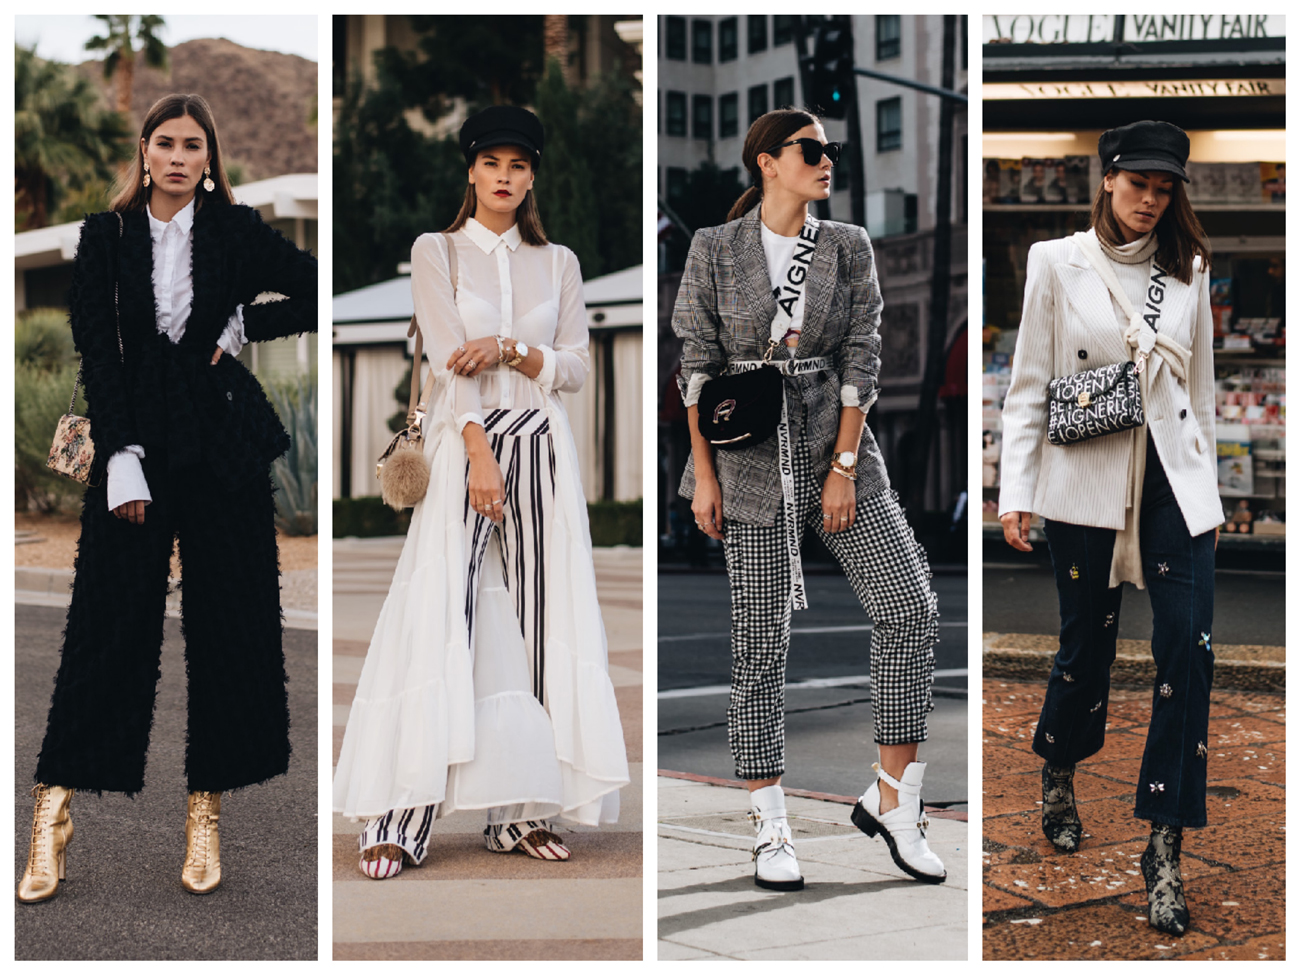 Mein großer Outfit Jahresrückblick 2018 | Fashiioncarpet